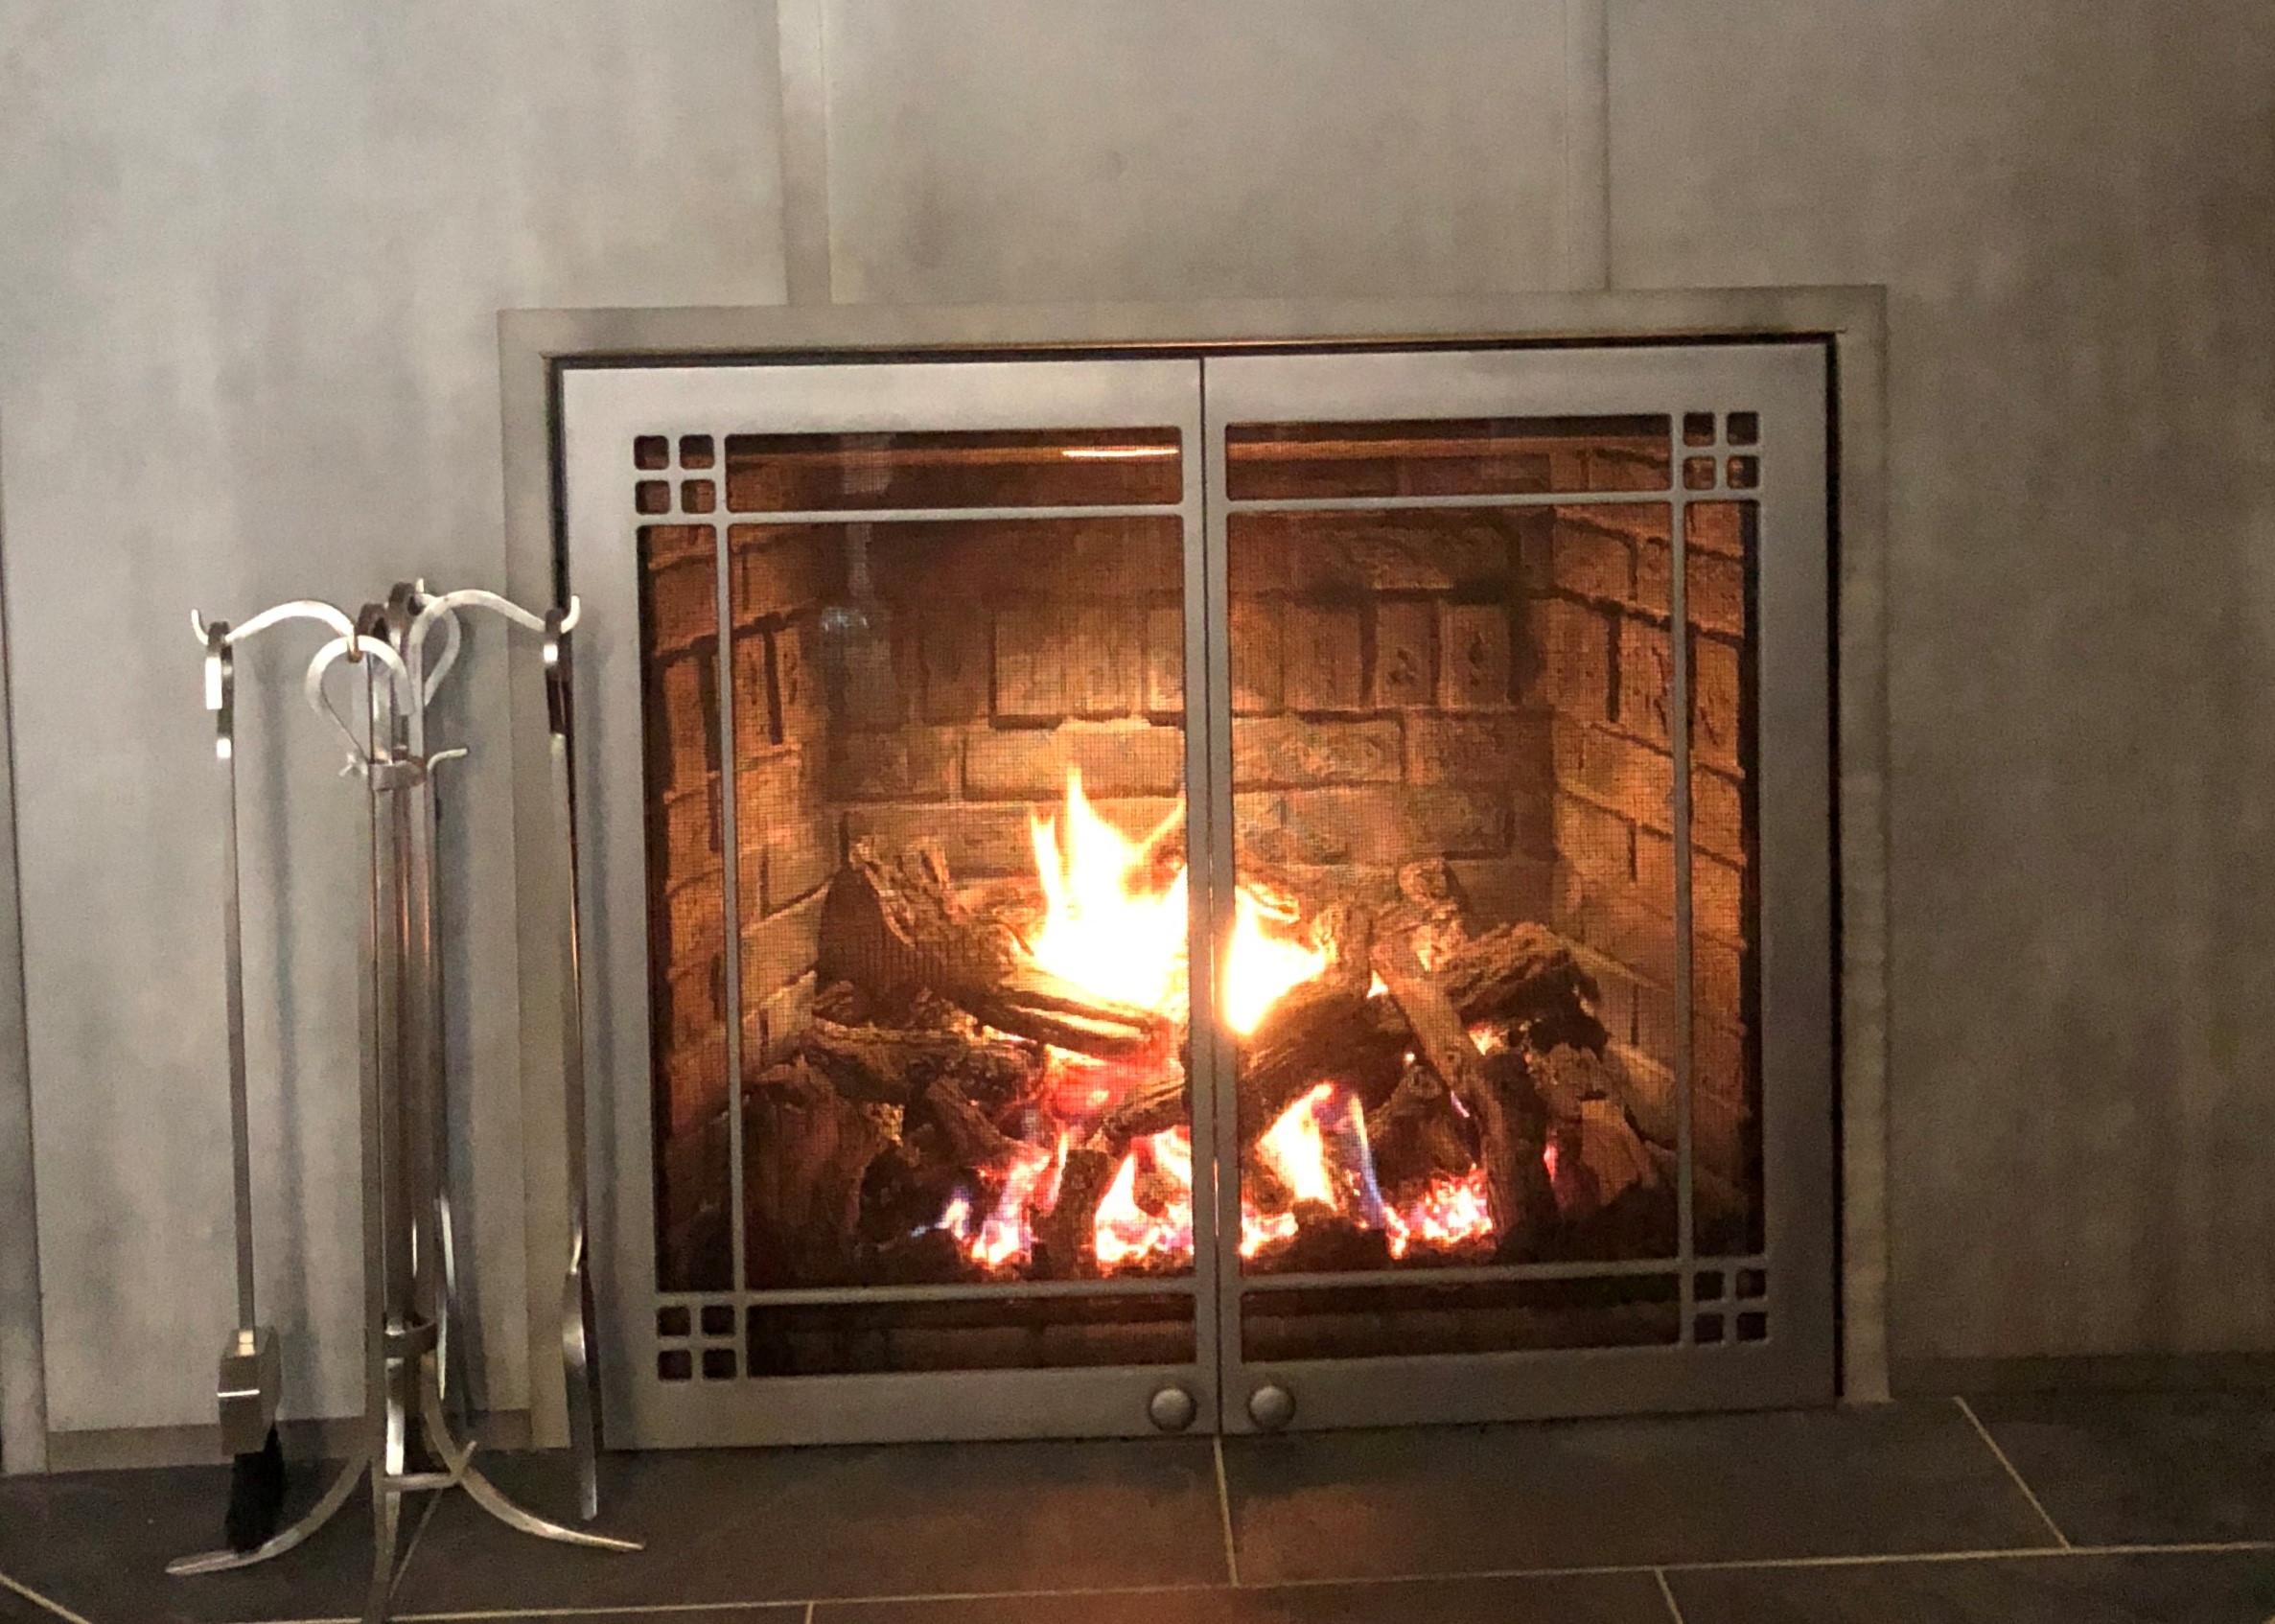 FullView 46 Gas Fireplace w/ Titanium Doors - Large Viewing Area, Brick Kit, Doors, Full Function Remote, Split Burner, Spotlight &45,500 BTUs of Heat. Includes Installation (gas & electric extra).Save $1,200